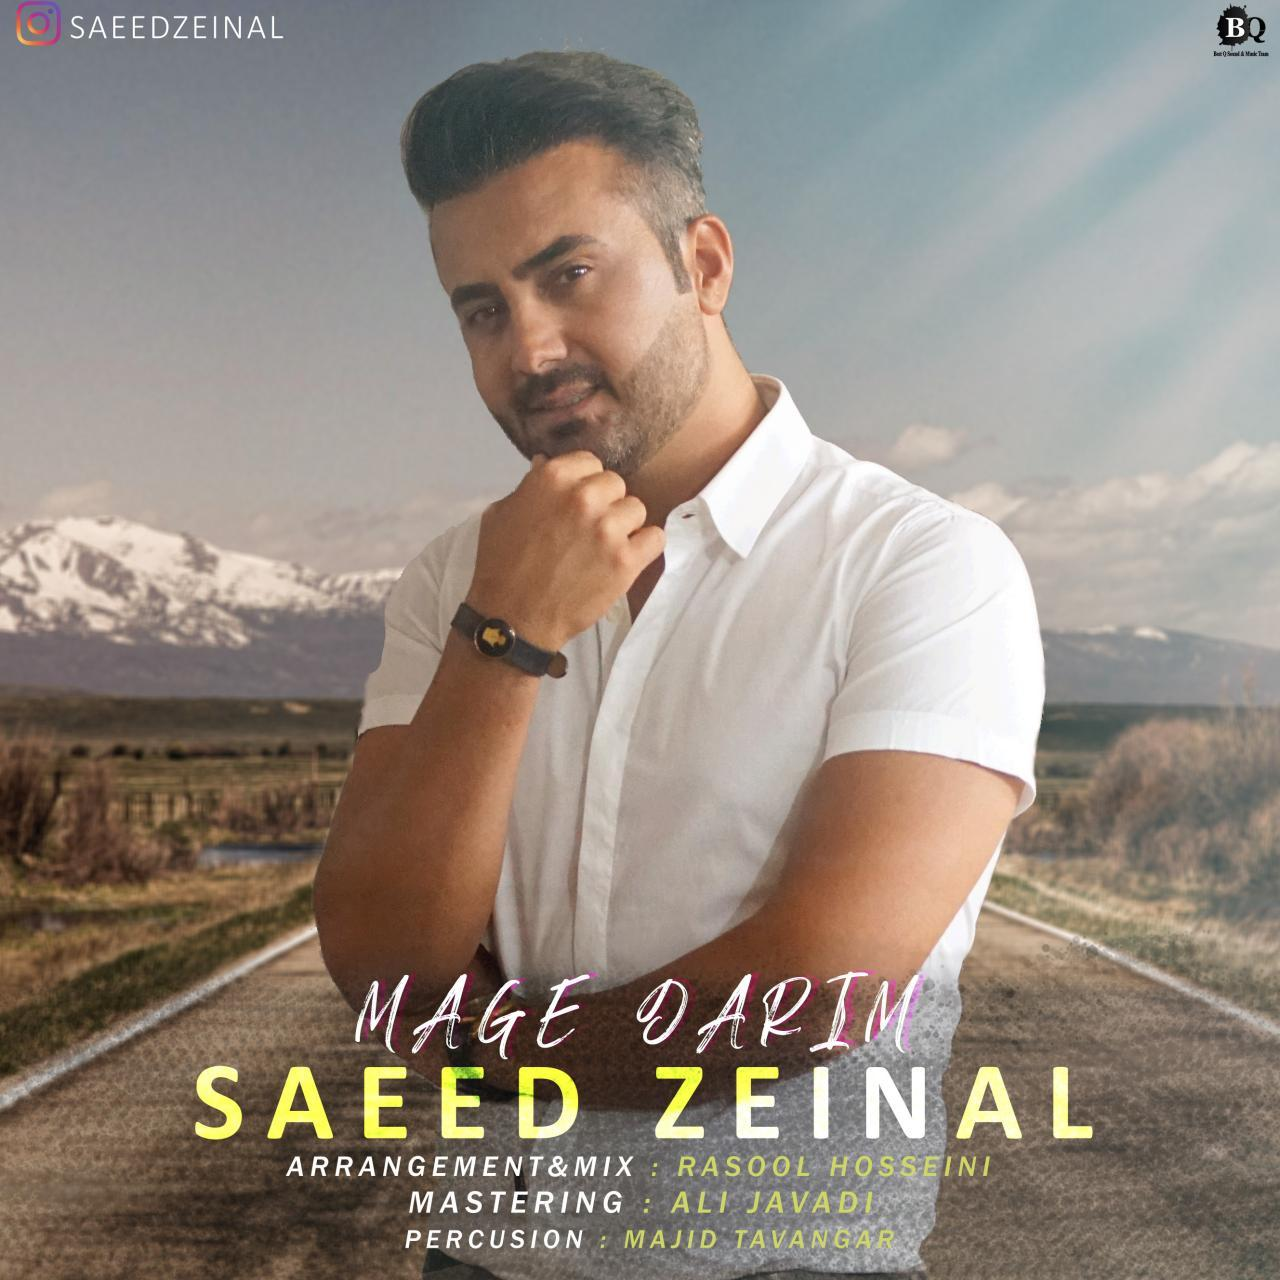 Saeed Zeinal – Mage Darim